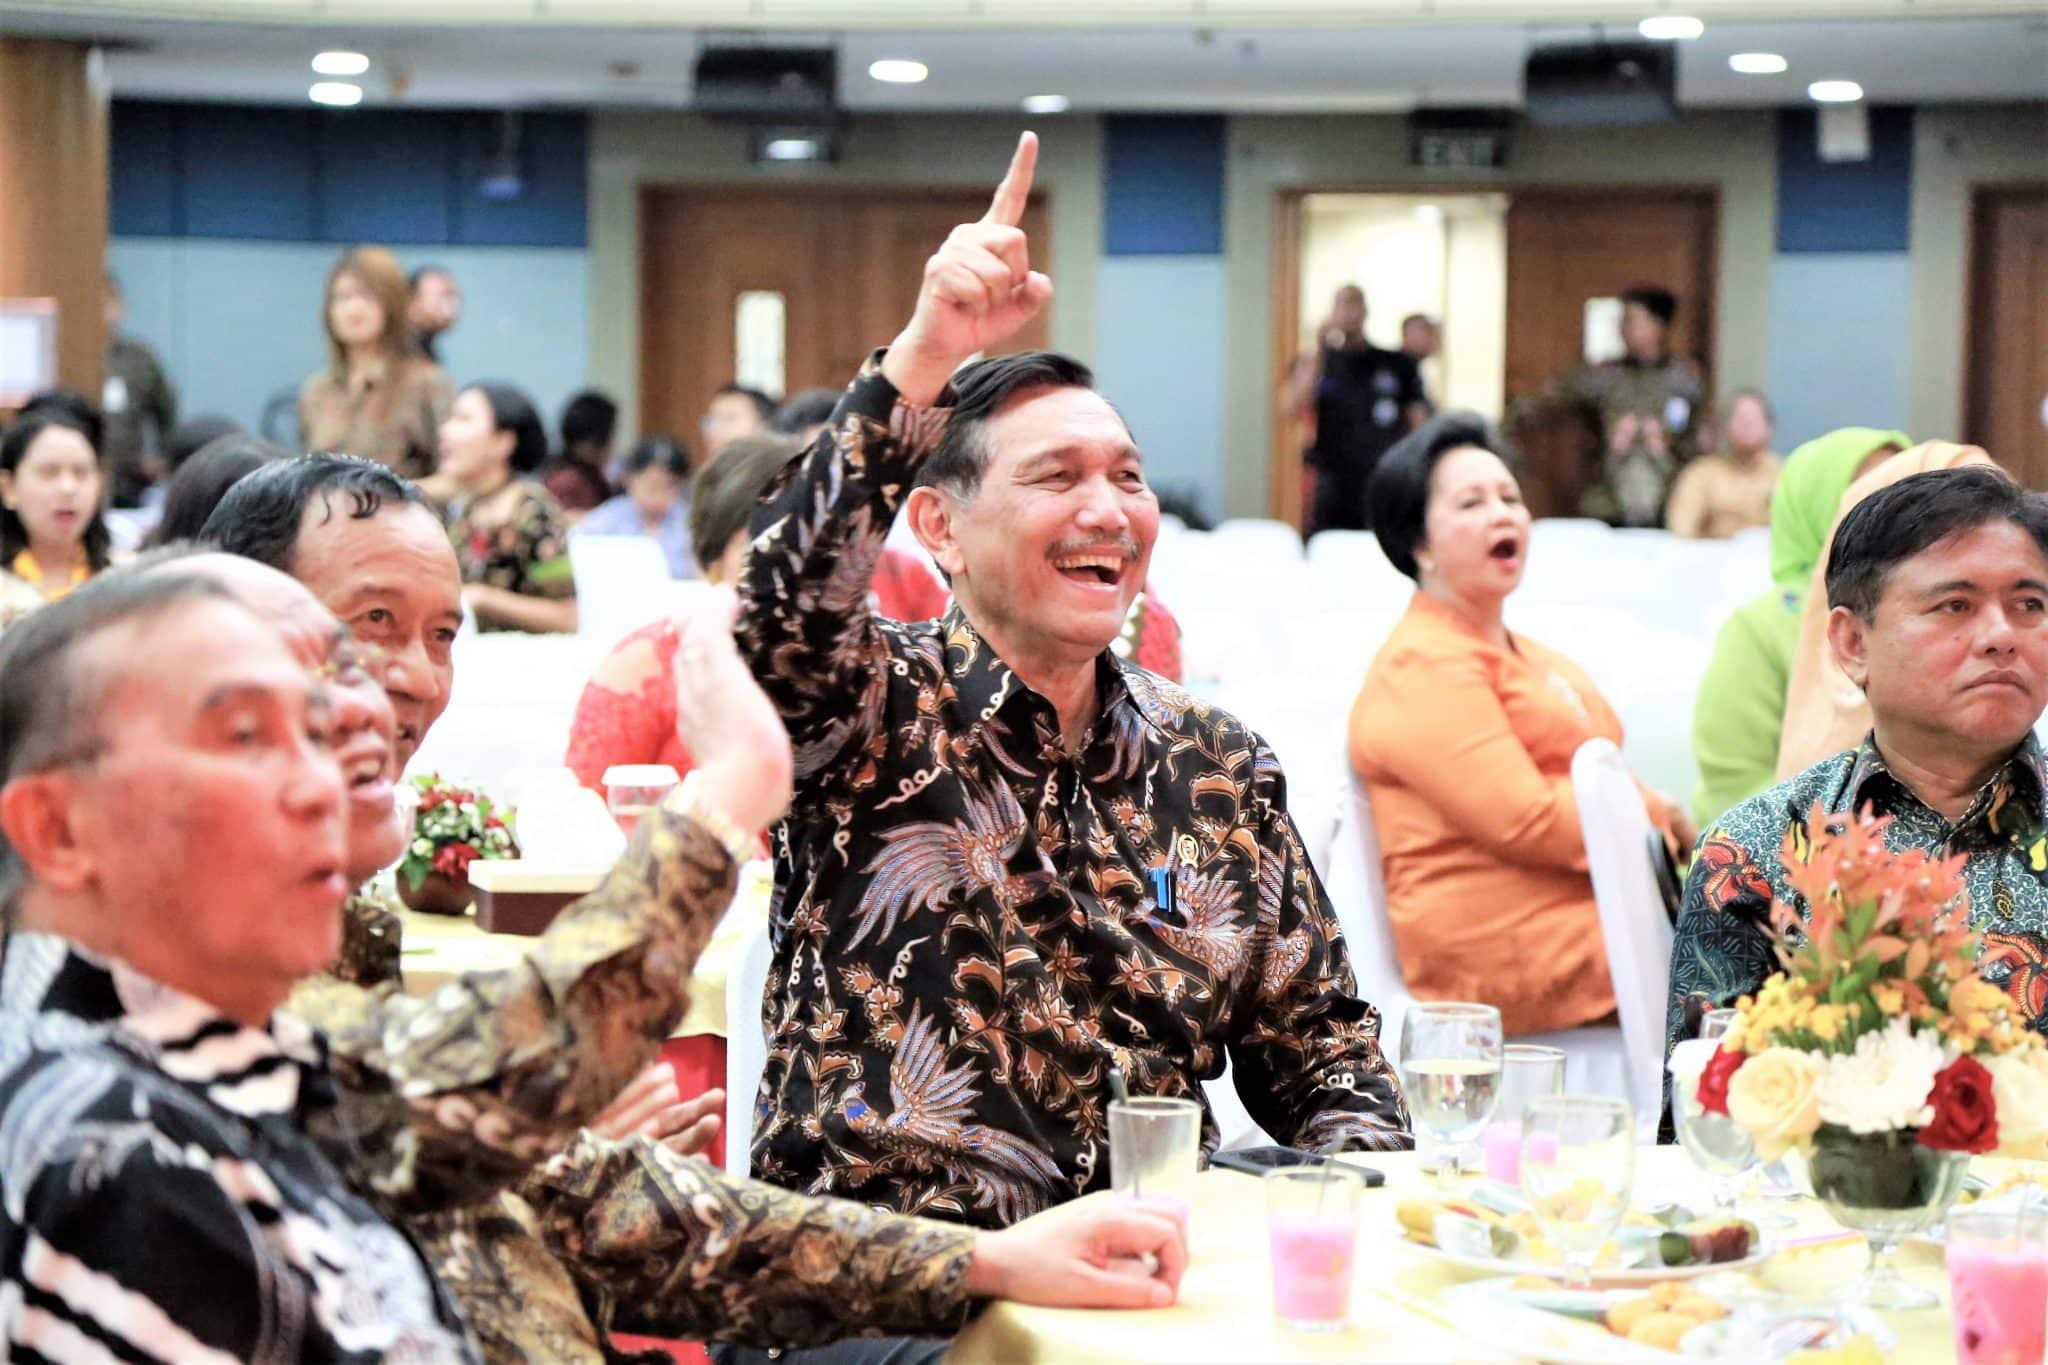 Menko Luhut Hadiri Perayaan Natal dan Tahun Baru 2018 di Auditorium BPPT